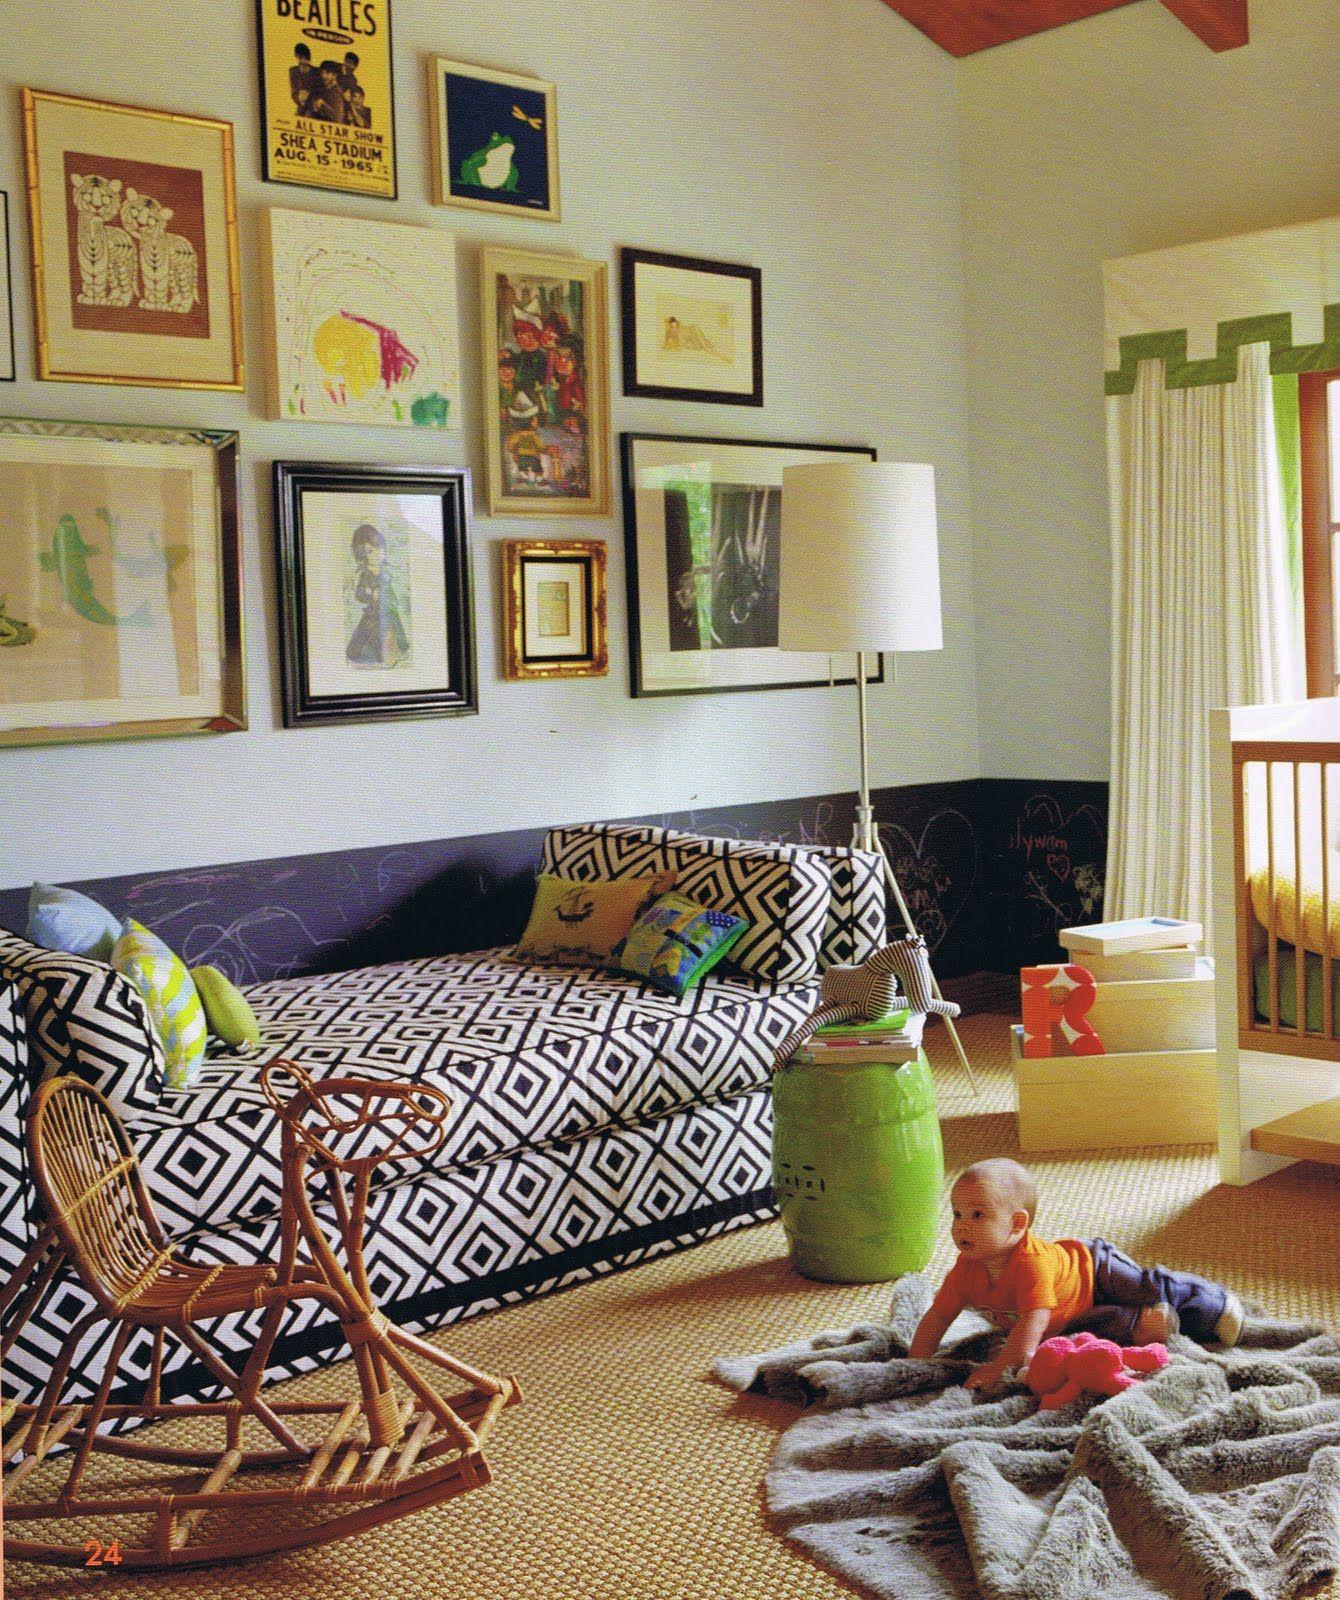 0f6e14b1fb3c72e4530d7ffc478d482c Pea Bedroom Decorating Ideas on bedroom wall ideas, small bedroom ideas, bedroom rugs, purple bedroom ideas, bedroom paint, bedroom color, master bedroom ideas, romantic bedroom ideas, bedroom themes, bedroom accessories, bedroom decor, bedroom sets, bedroom makeovers, living room design ideas, bedroom design, blue bedroom ideas, modern bedroom ideas, bedroom headboard ideas, bedroom painting ideas,